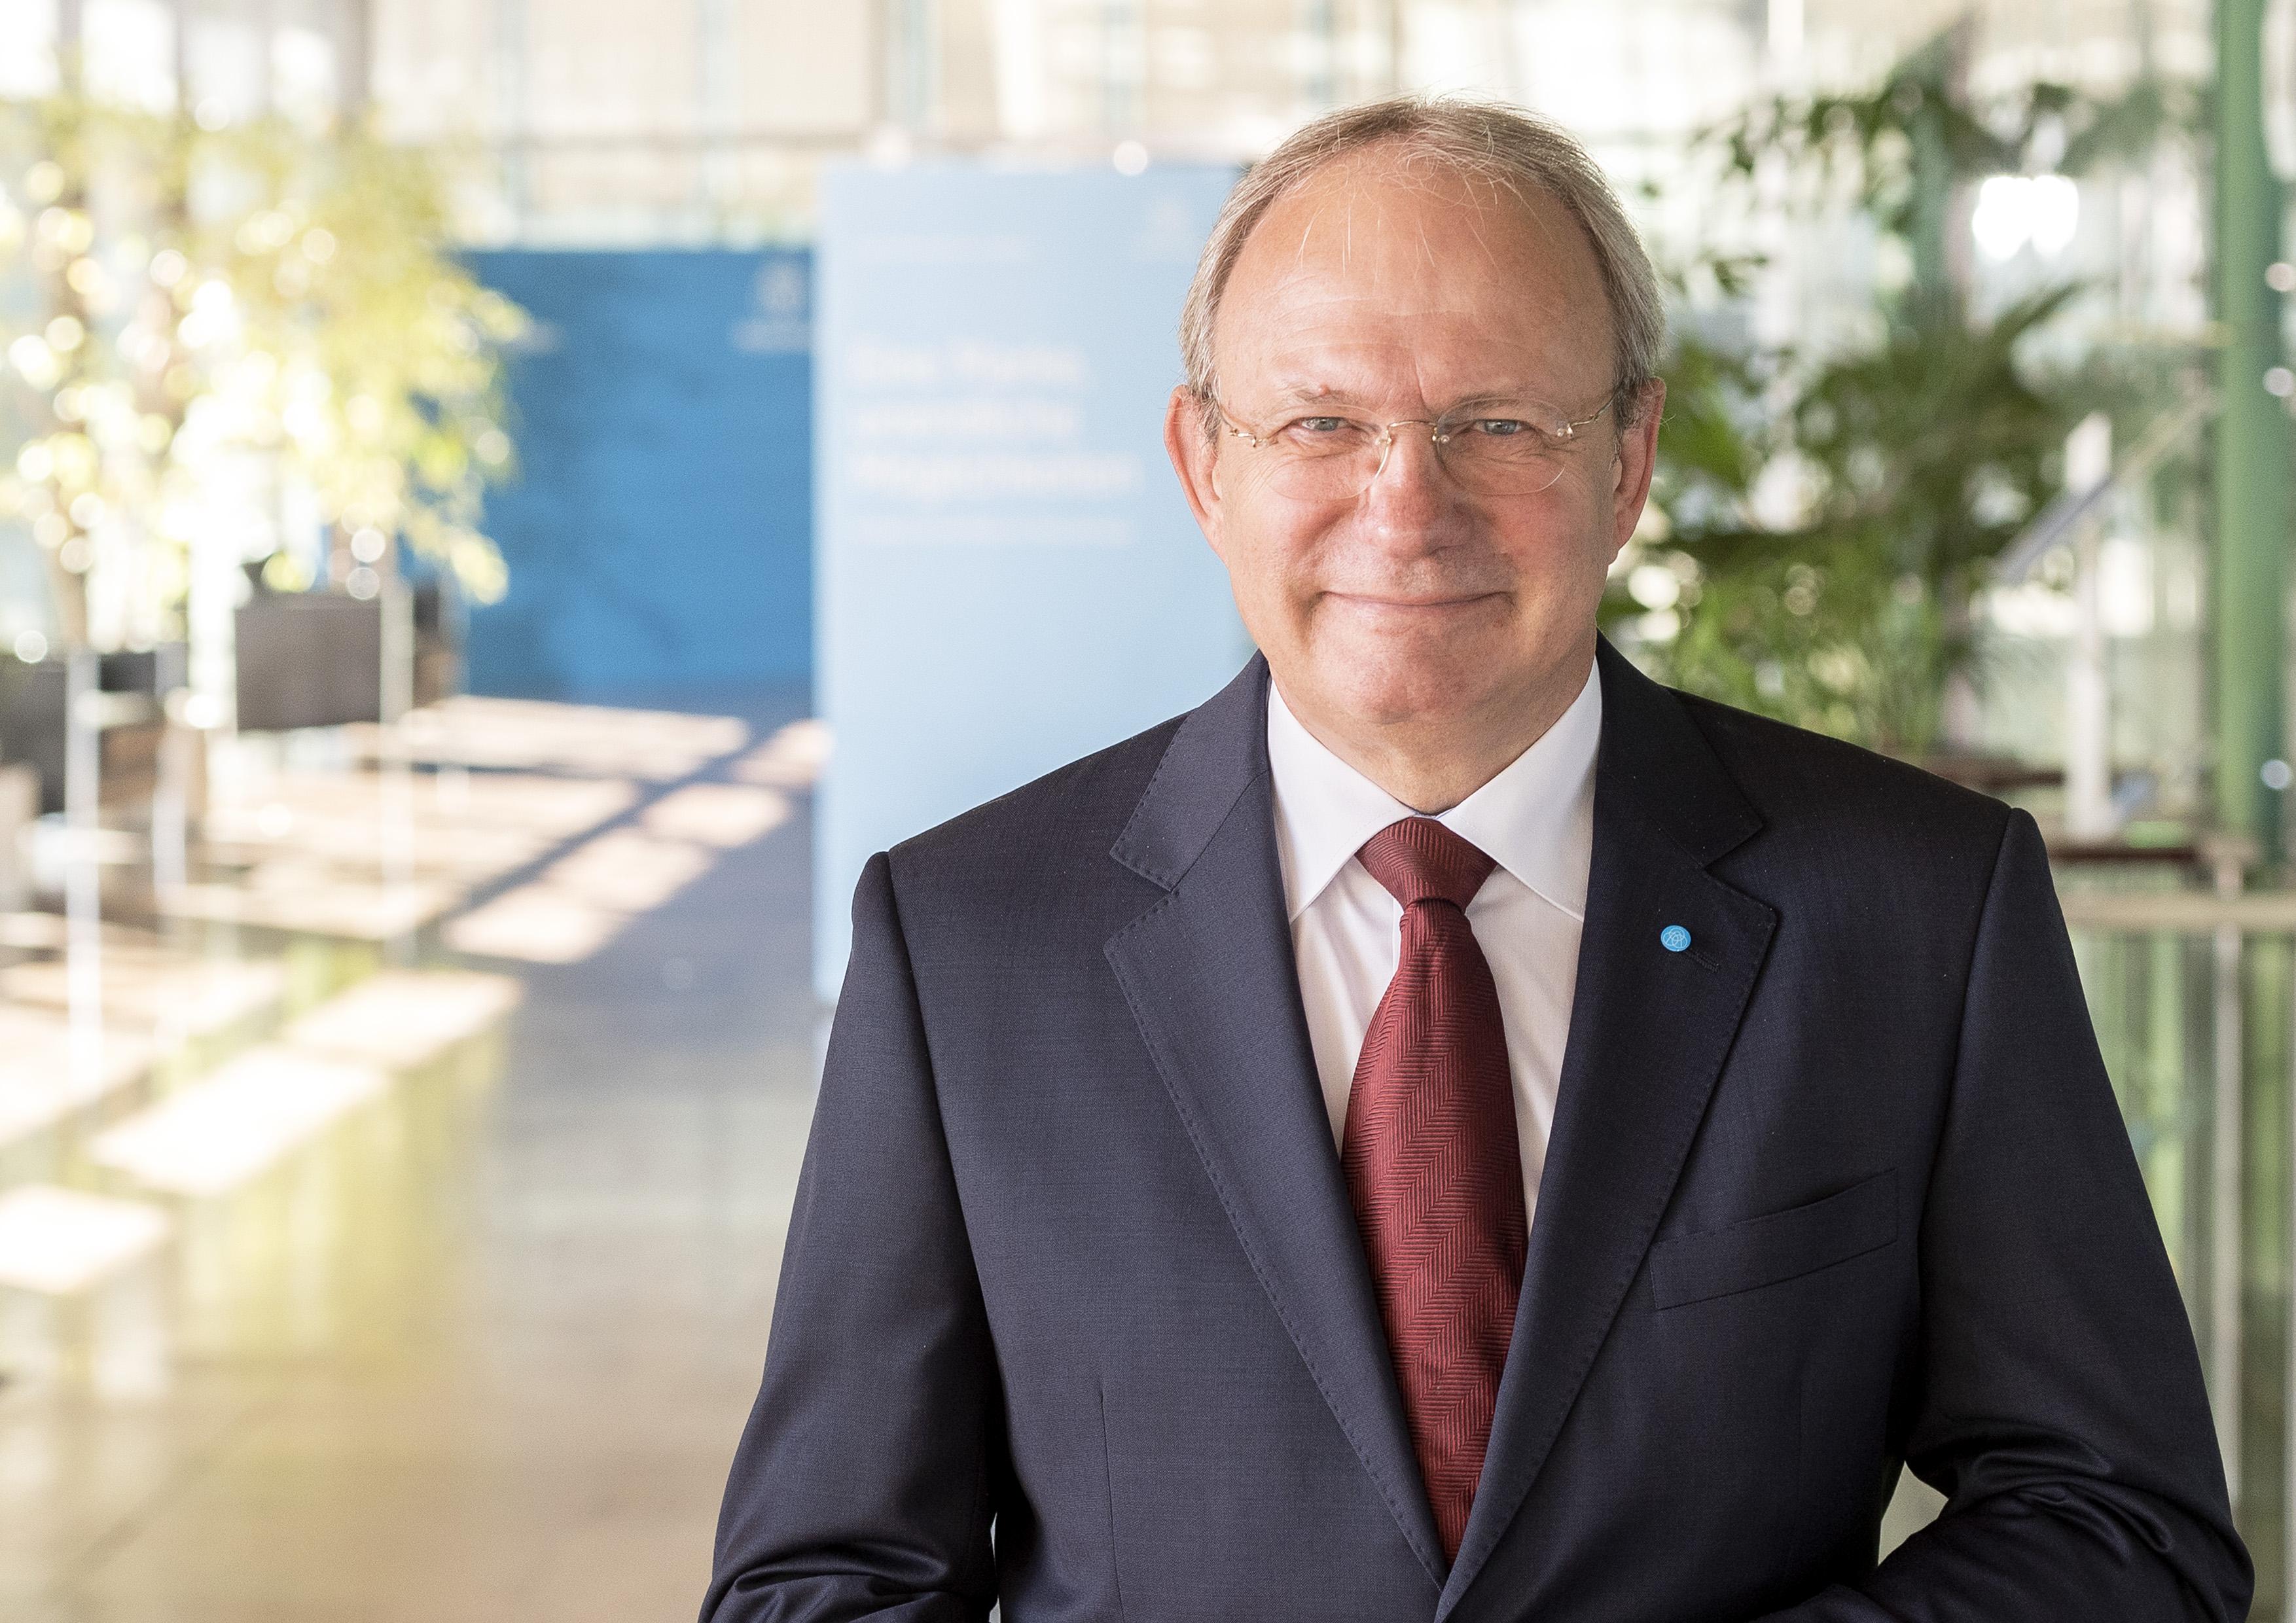 Jens Reichel, Quelle: thyssenkrupp